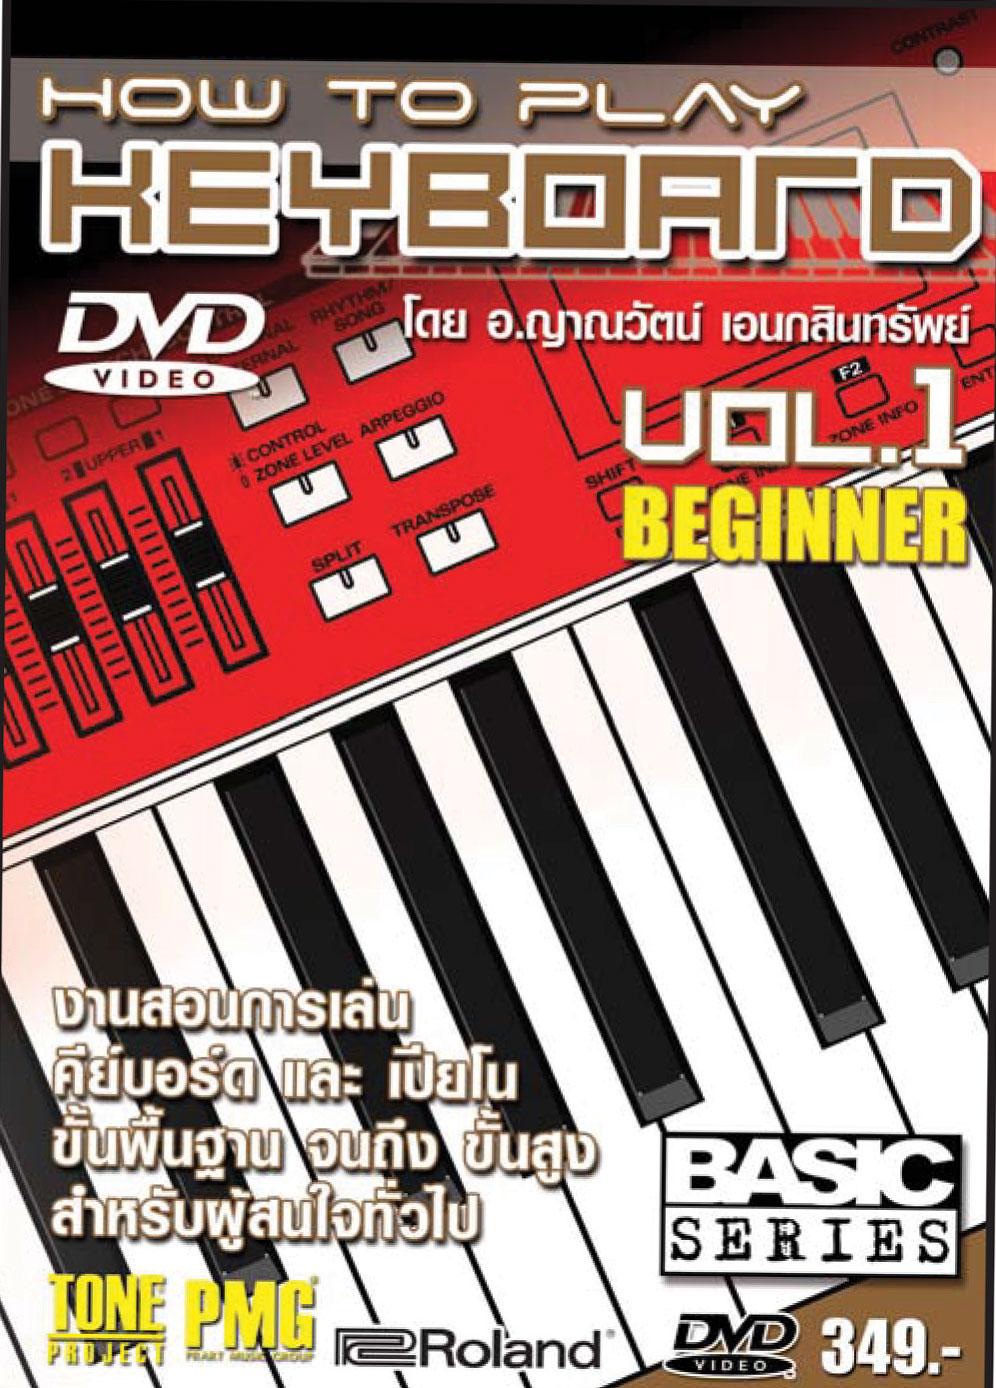 How To Play Keyboard Vol.1 Beginner (DVD)